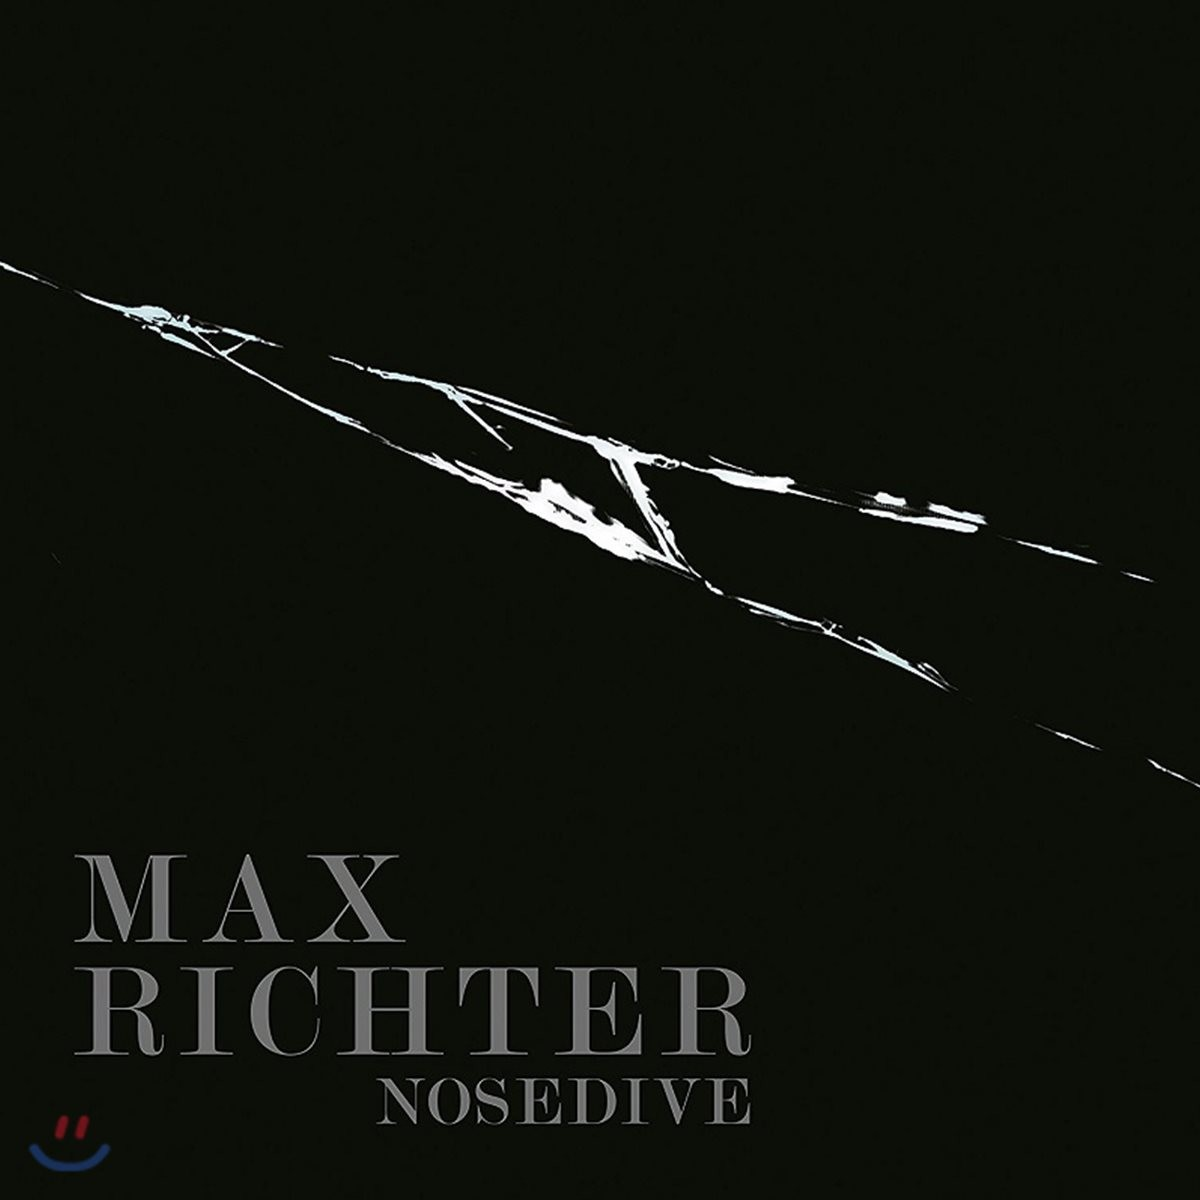 Max Richter 막스 리히터: TV시리즈 '블랙 미러 시즌3 에피소드 1: 추락 편' 사운드트랙 (Black Mirror: Nosedive OST)